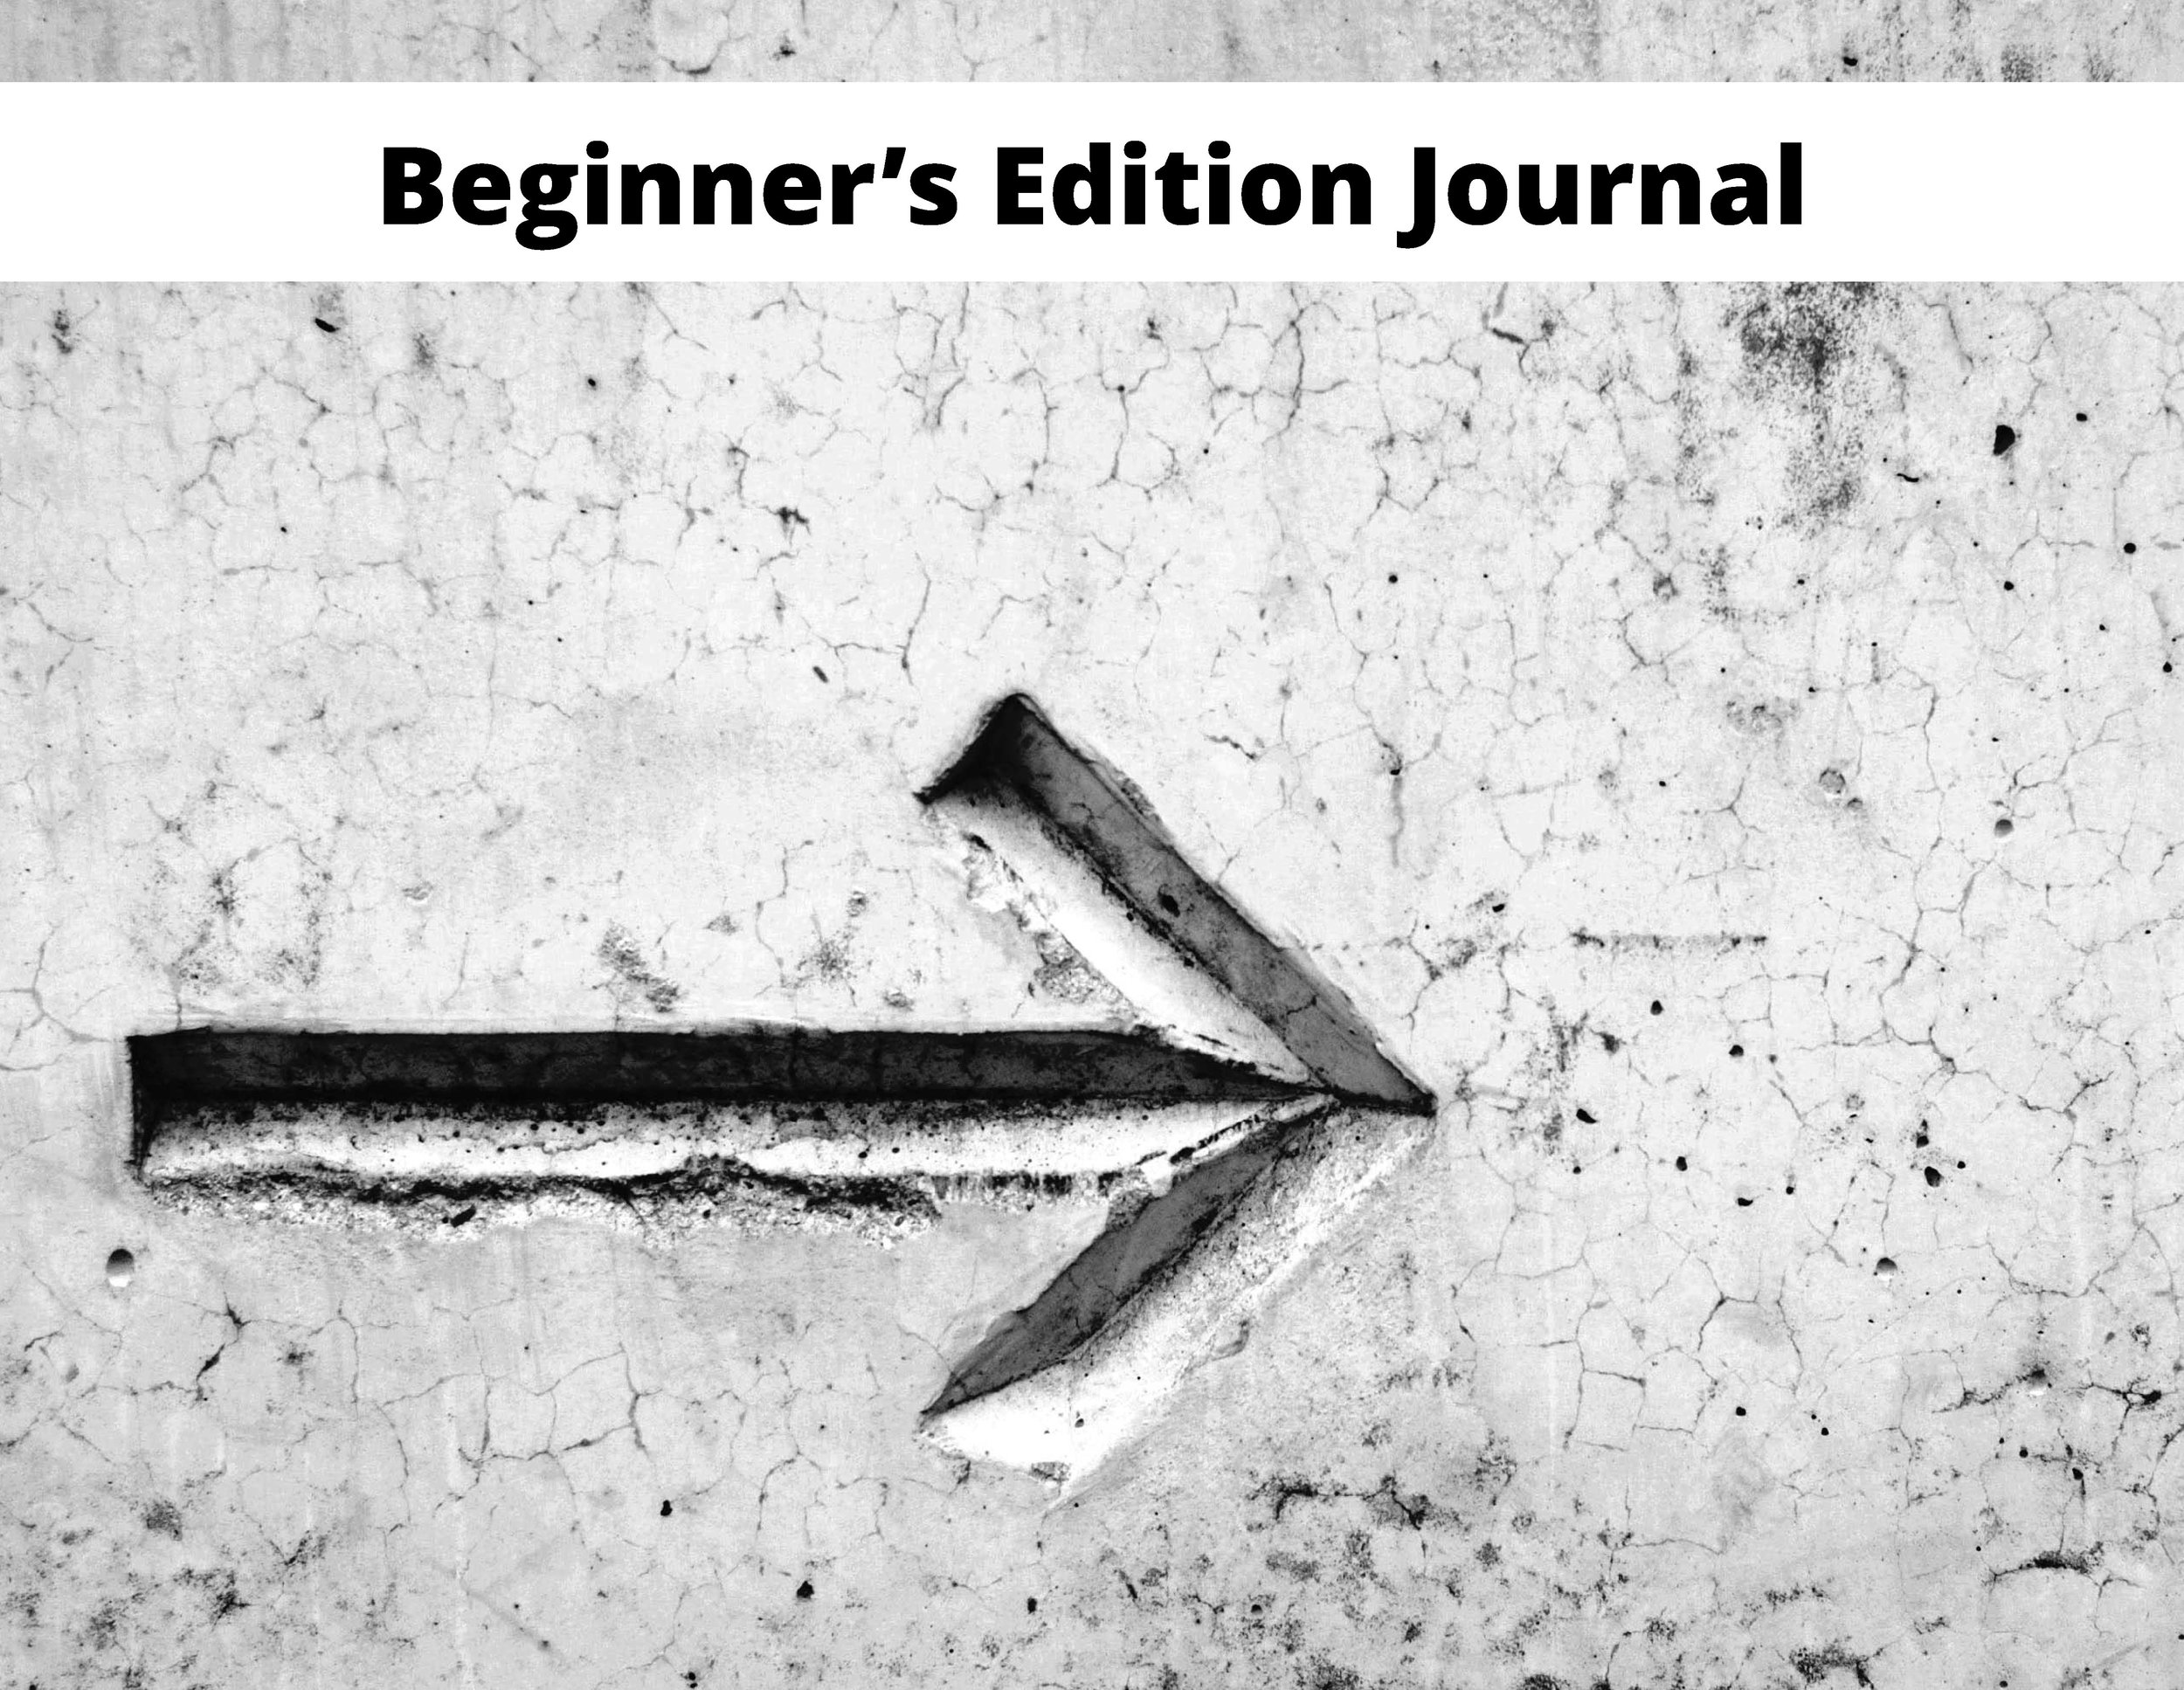 Beginner's Edition Journal